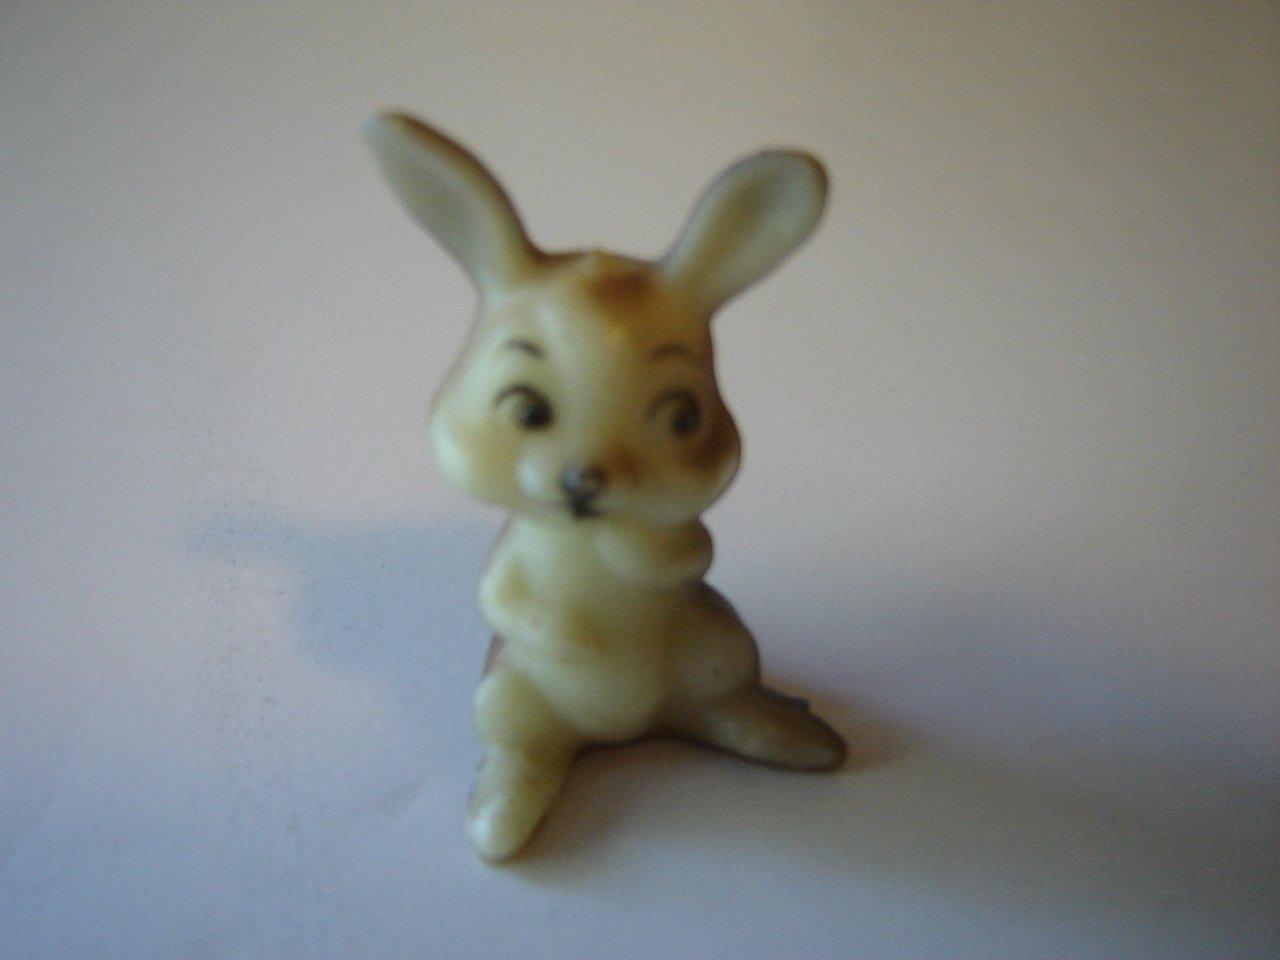 Vintage Wilton Bunny Cake Figurine Plastic Rabbit 1 5